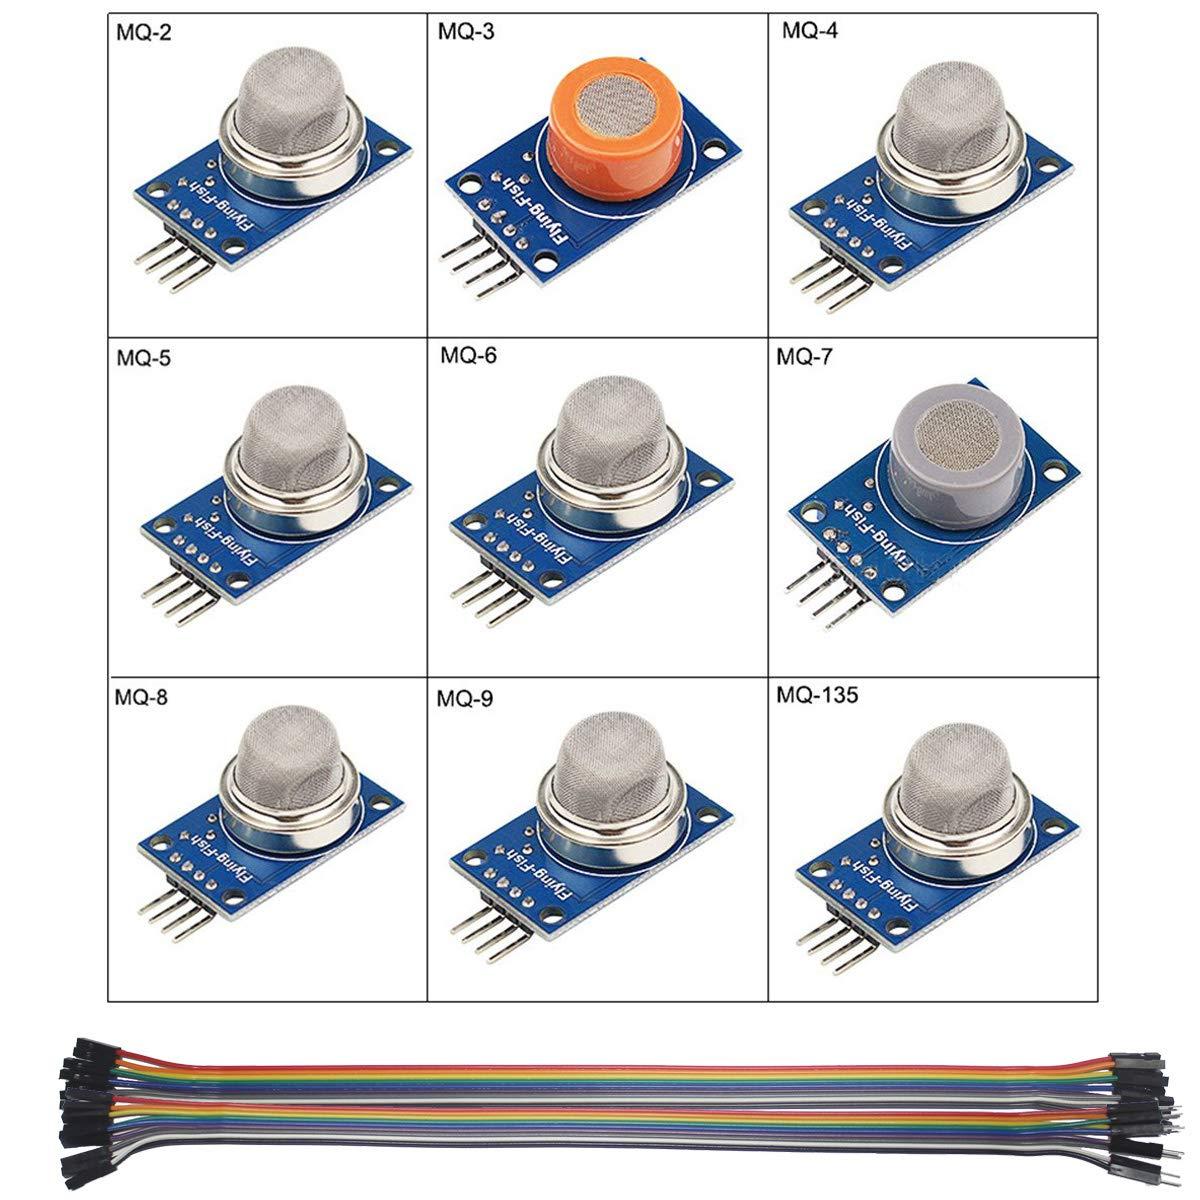 Youmile Arduino Kit Smoke Detection